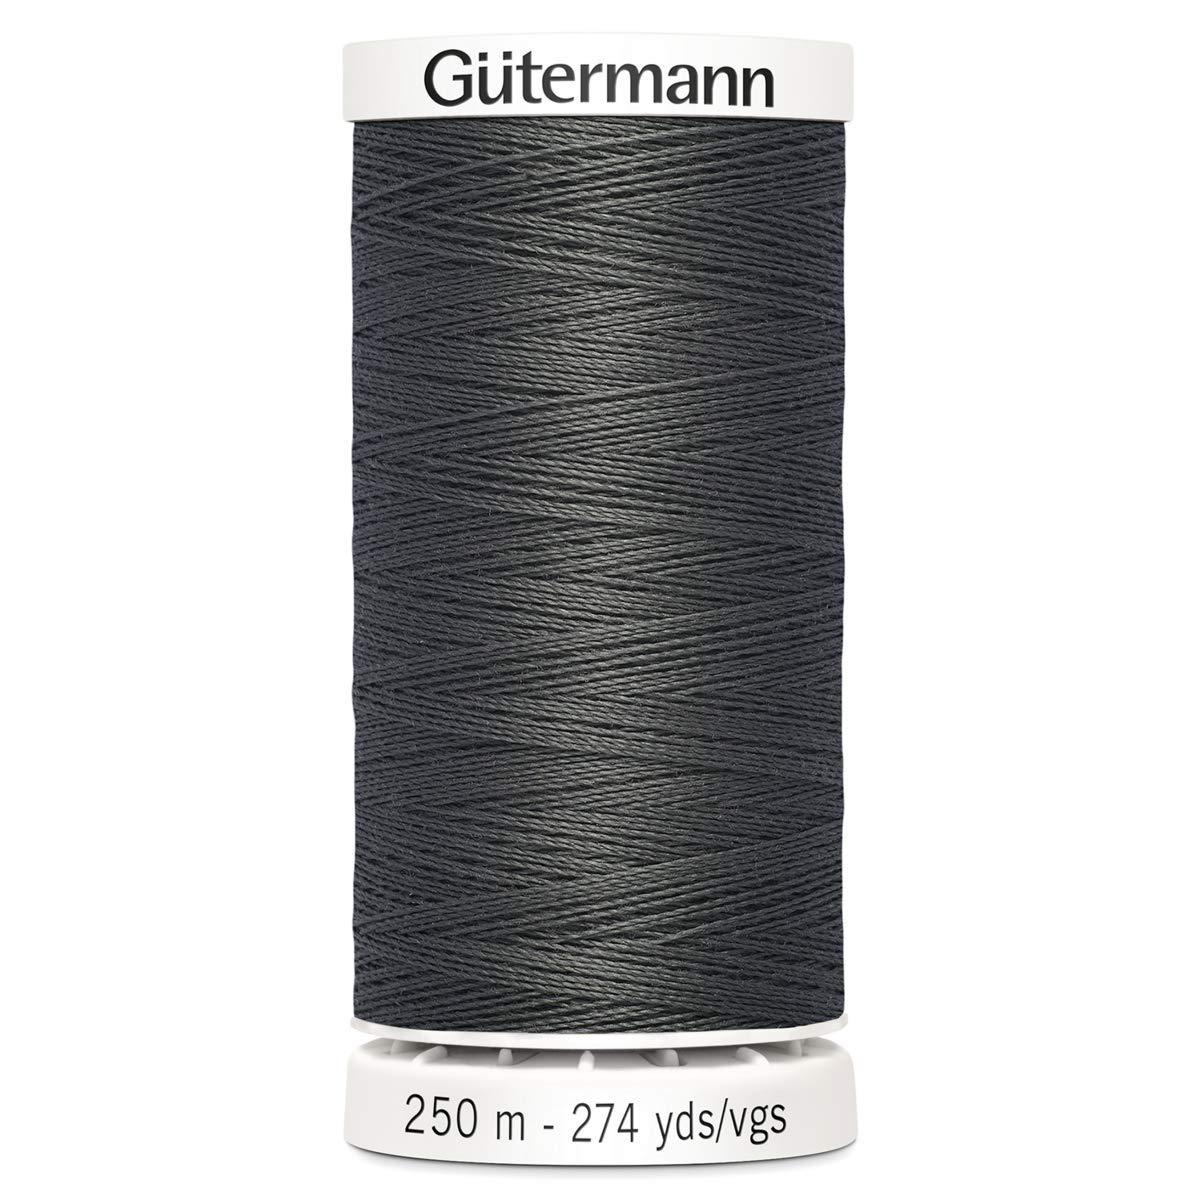 Gutermann Sew All Polyester Thread, 250Mtr, Smoke Grey (0702) GUT_717878_0702-1